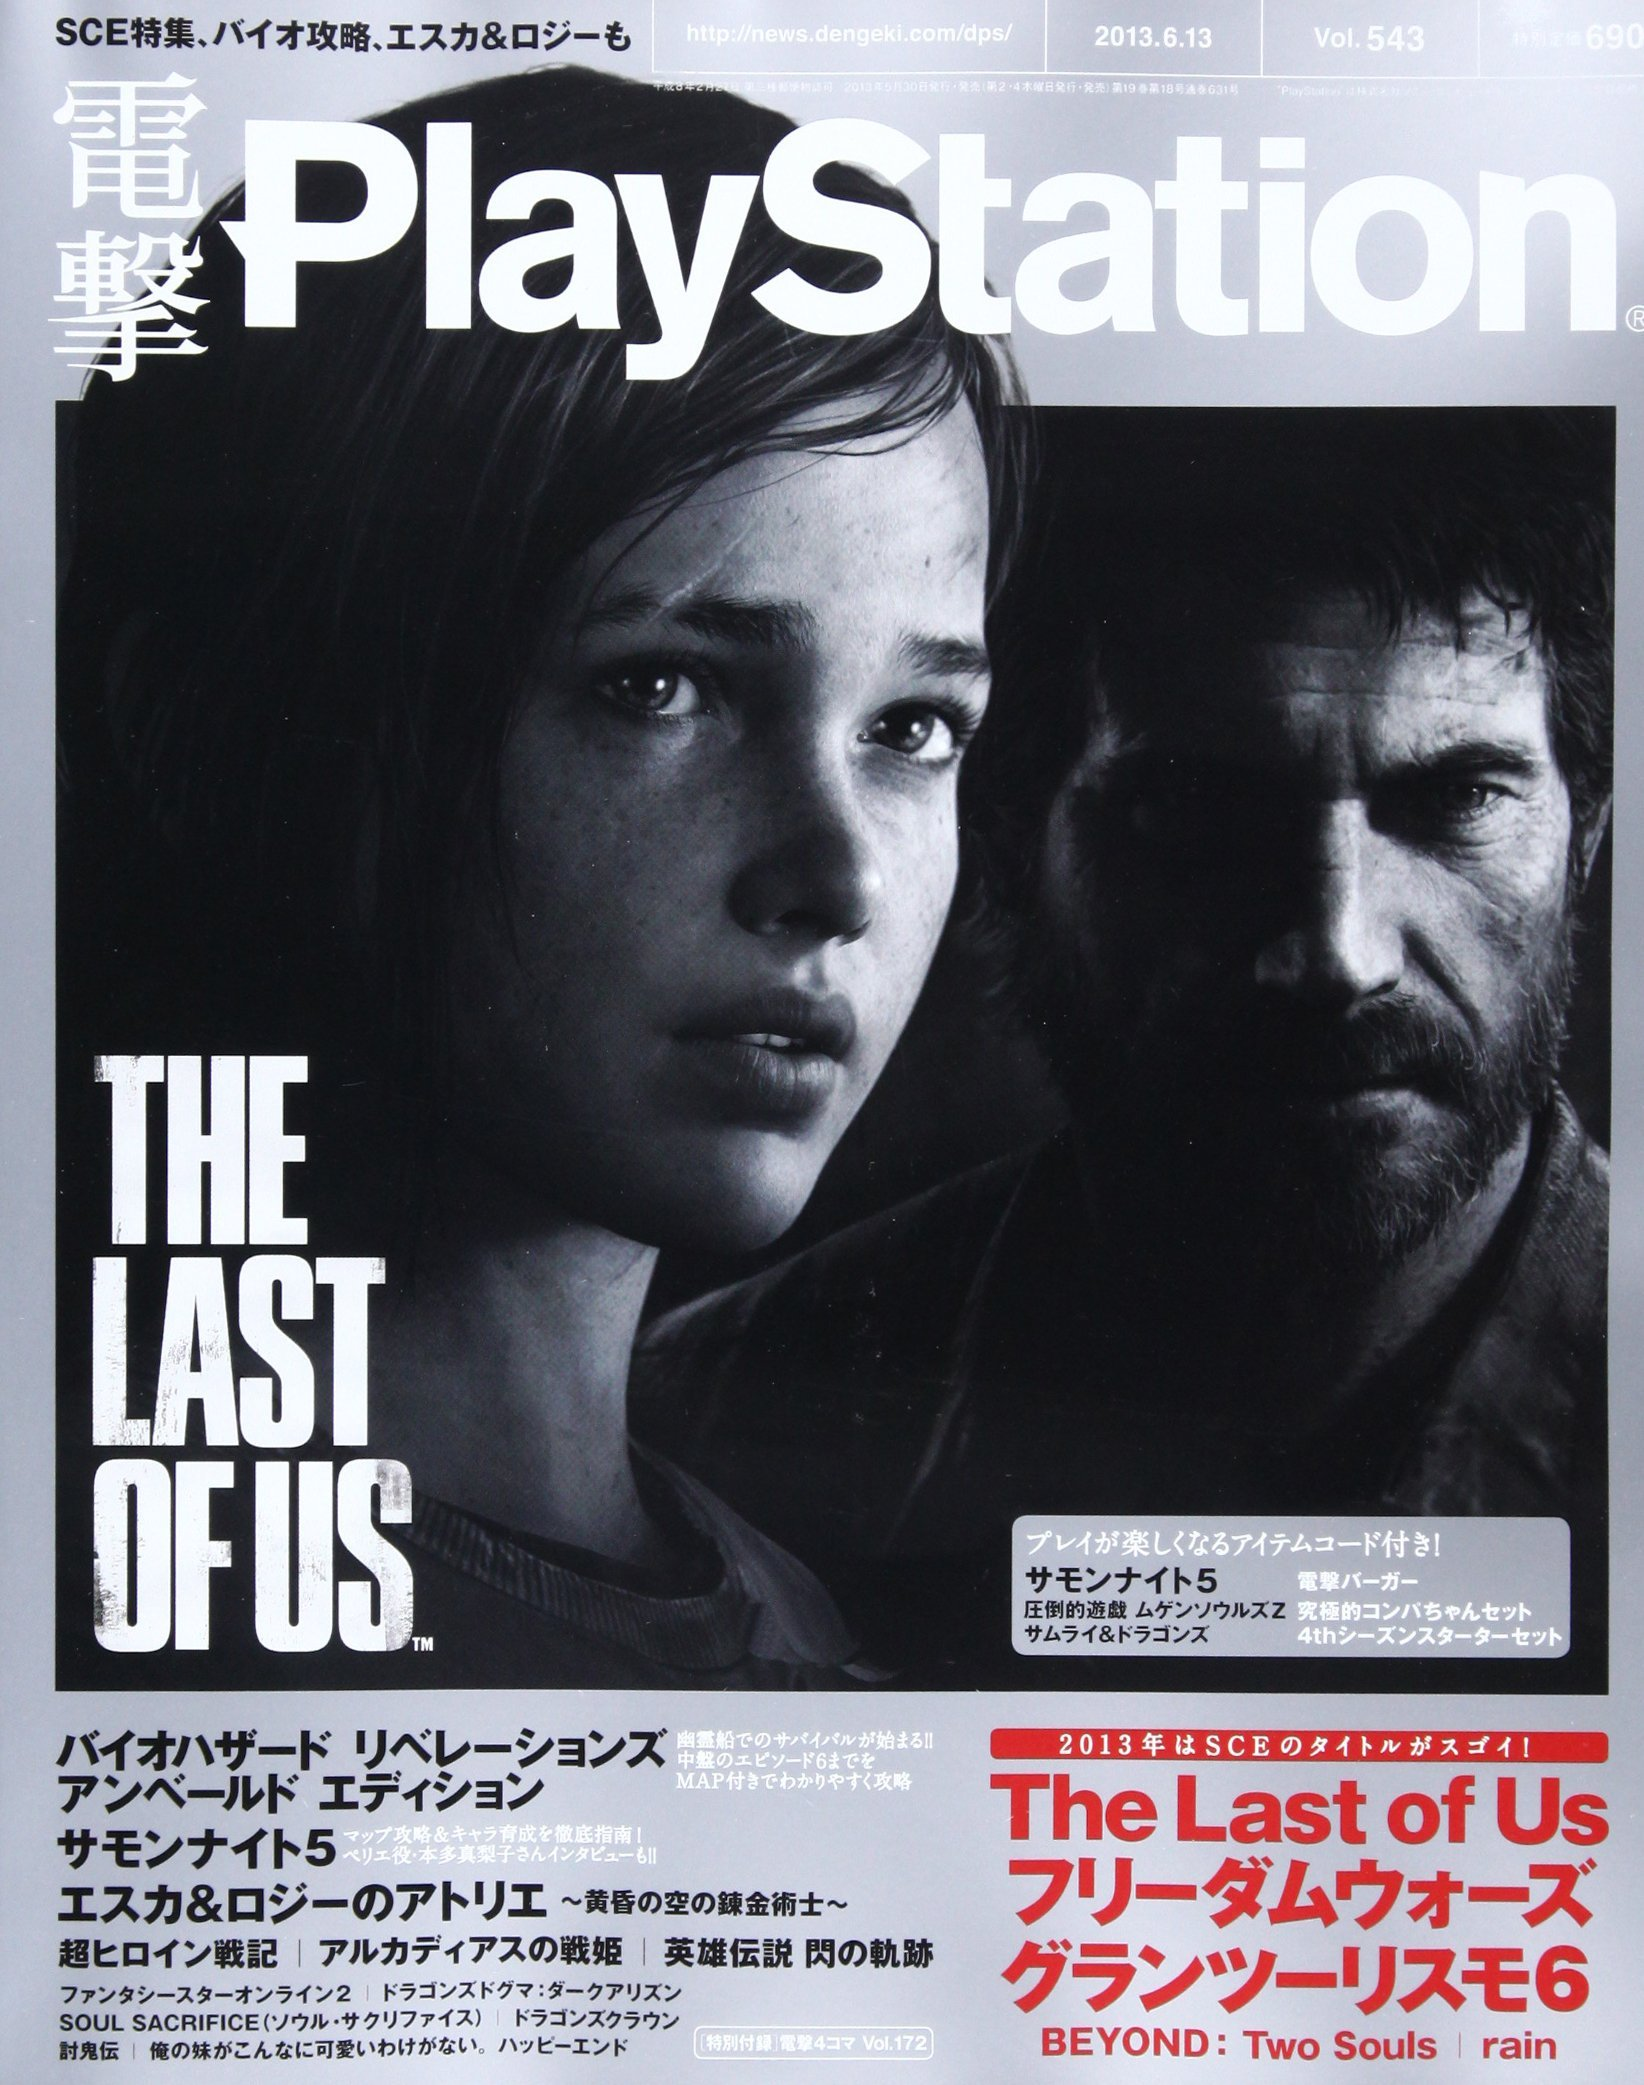 Dengeki PlayStation 543 (June 13, 2013)